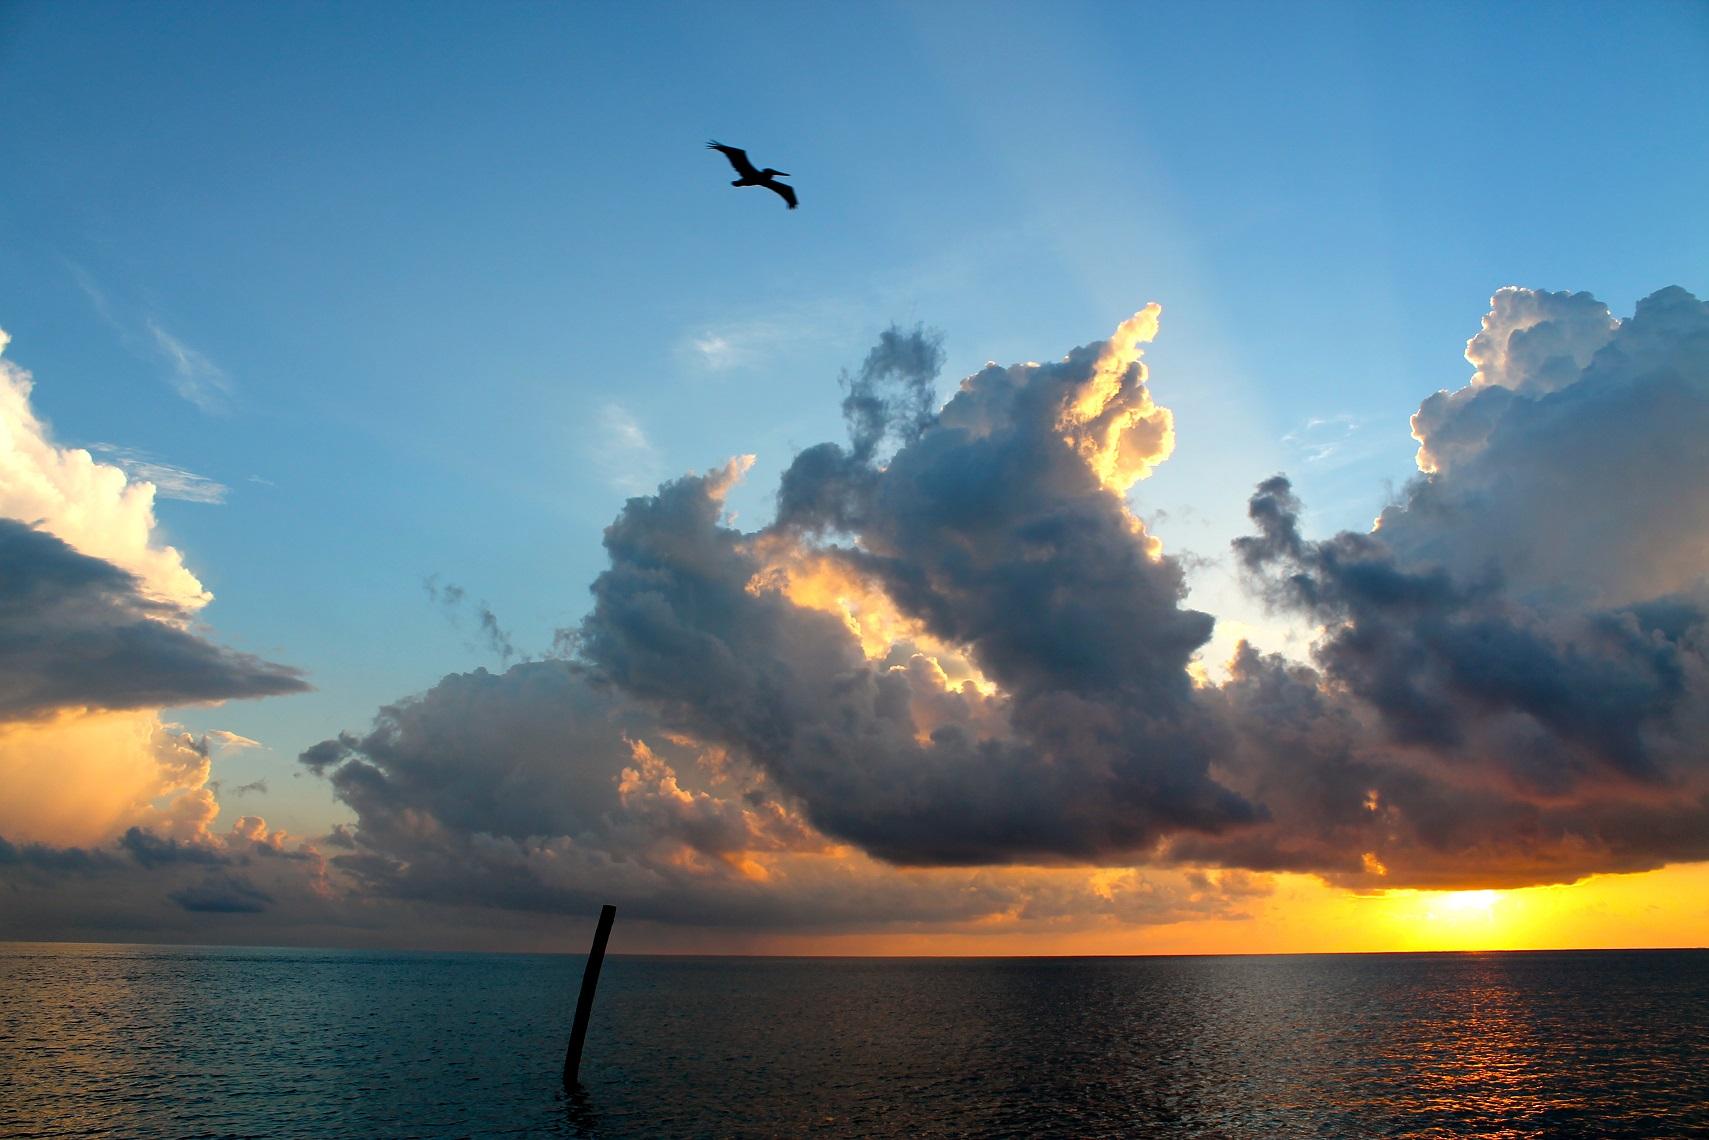 A Pelican enjoys a sunrise over the Caribbean Sea n front of Caye Caulker